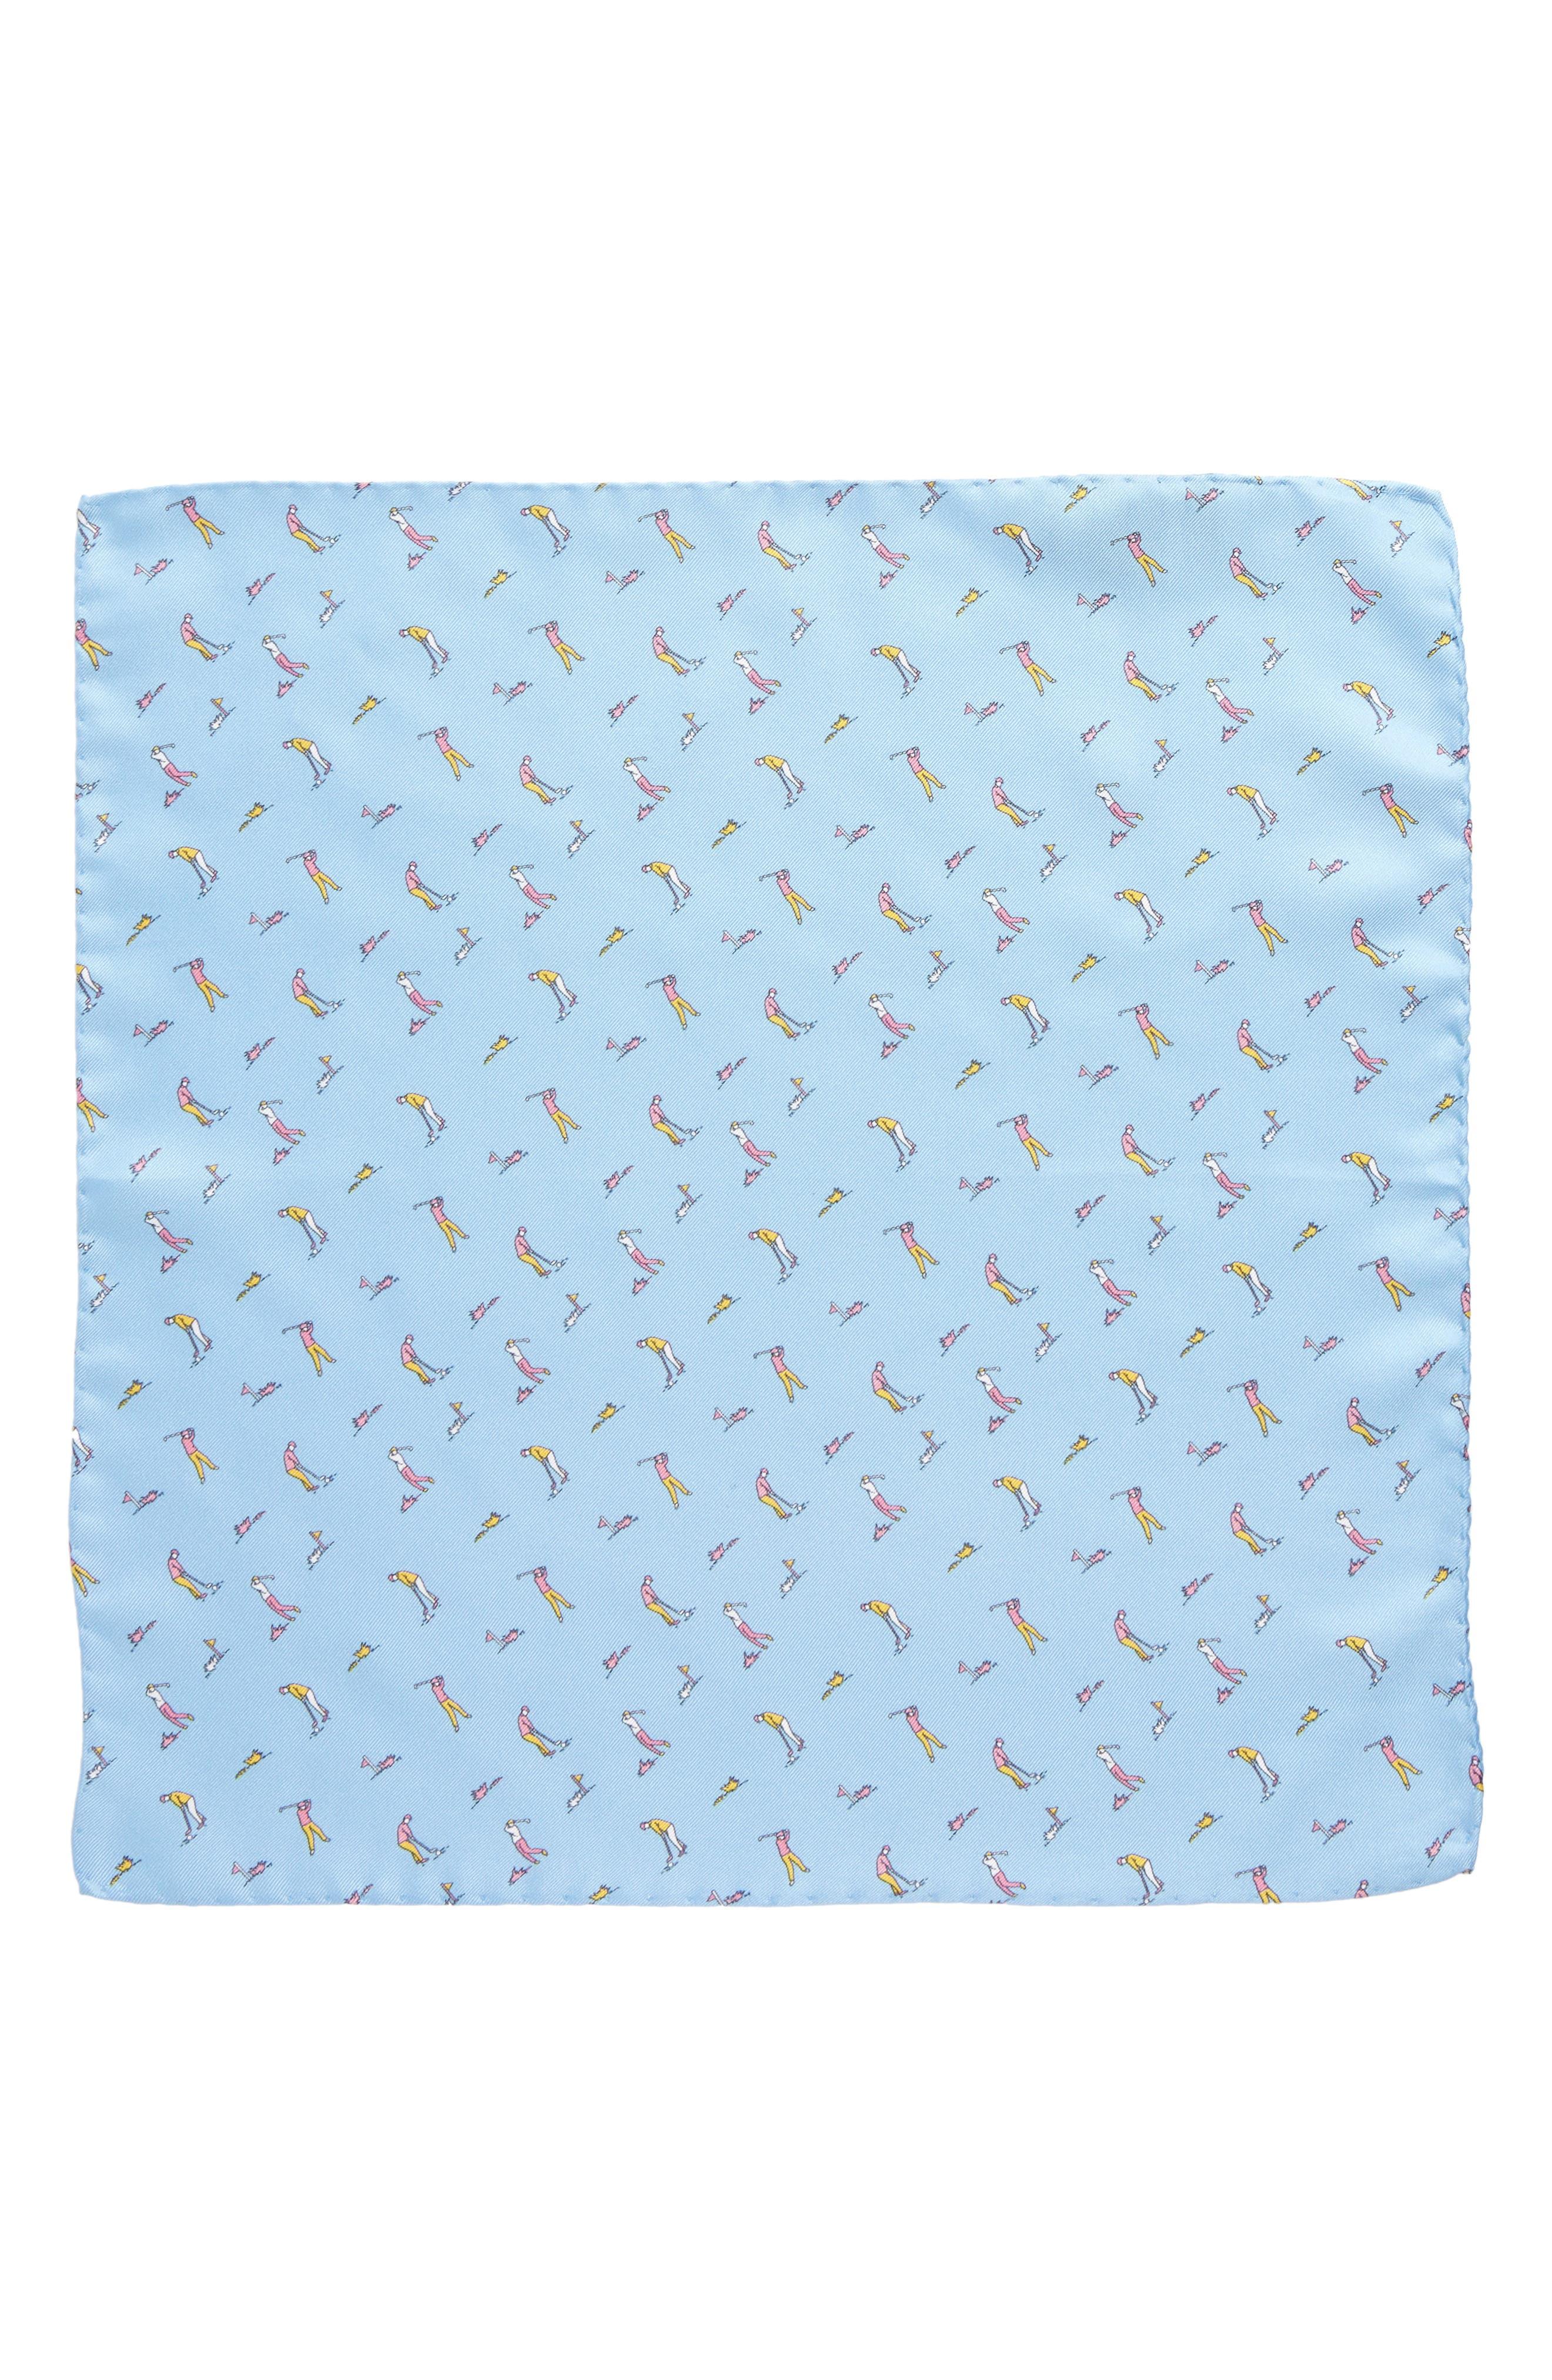 Foreplay Silk Pocket Square,                             Alternate thumbnail 2, color,                             LIGHT BLUE